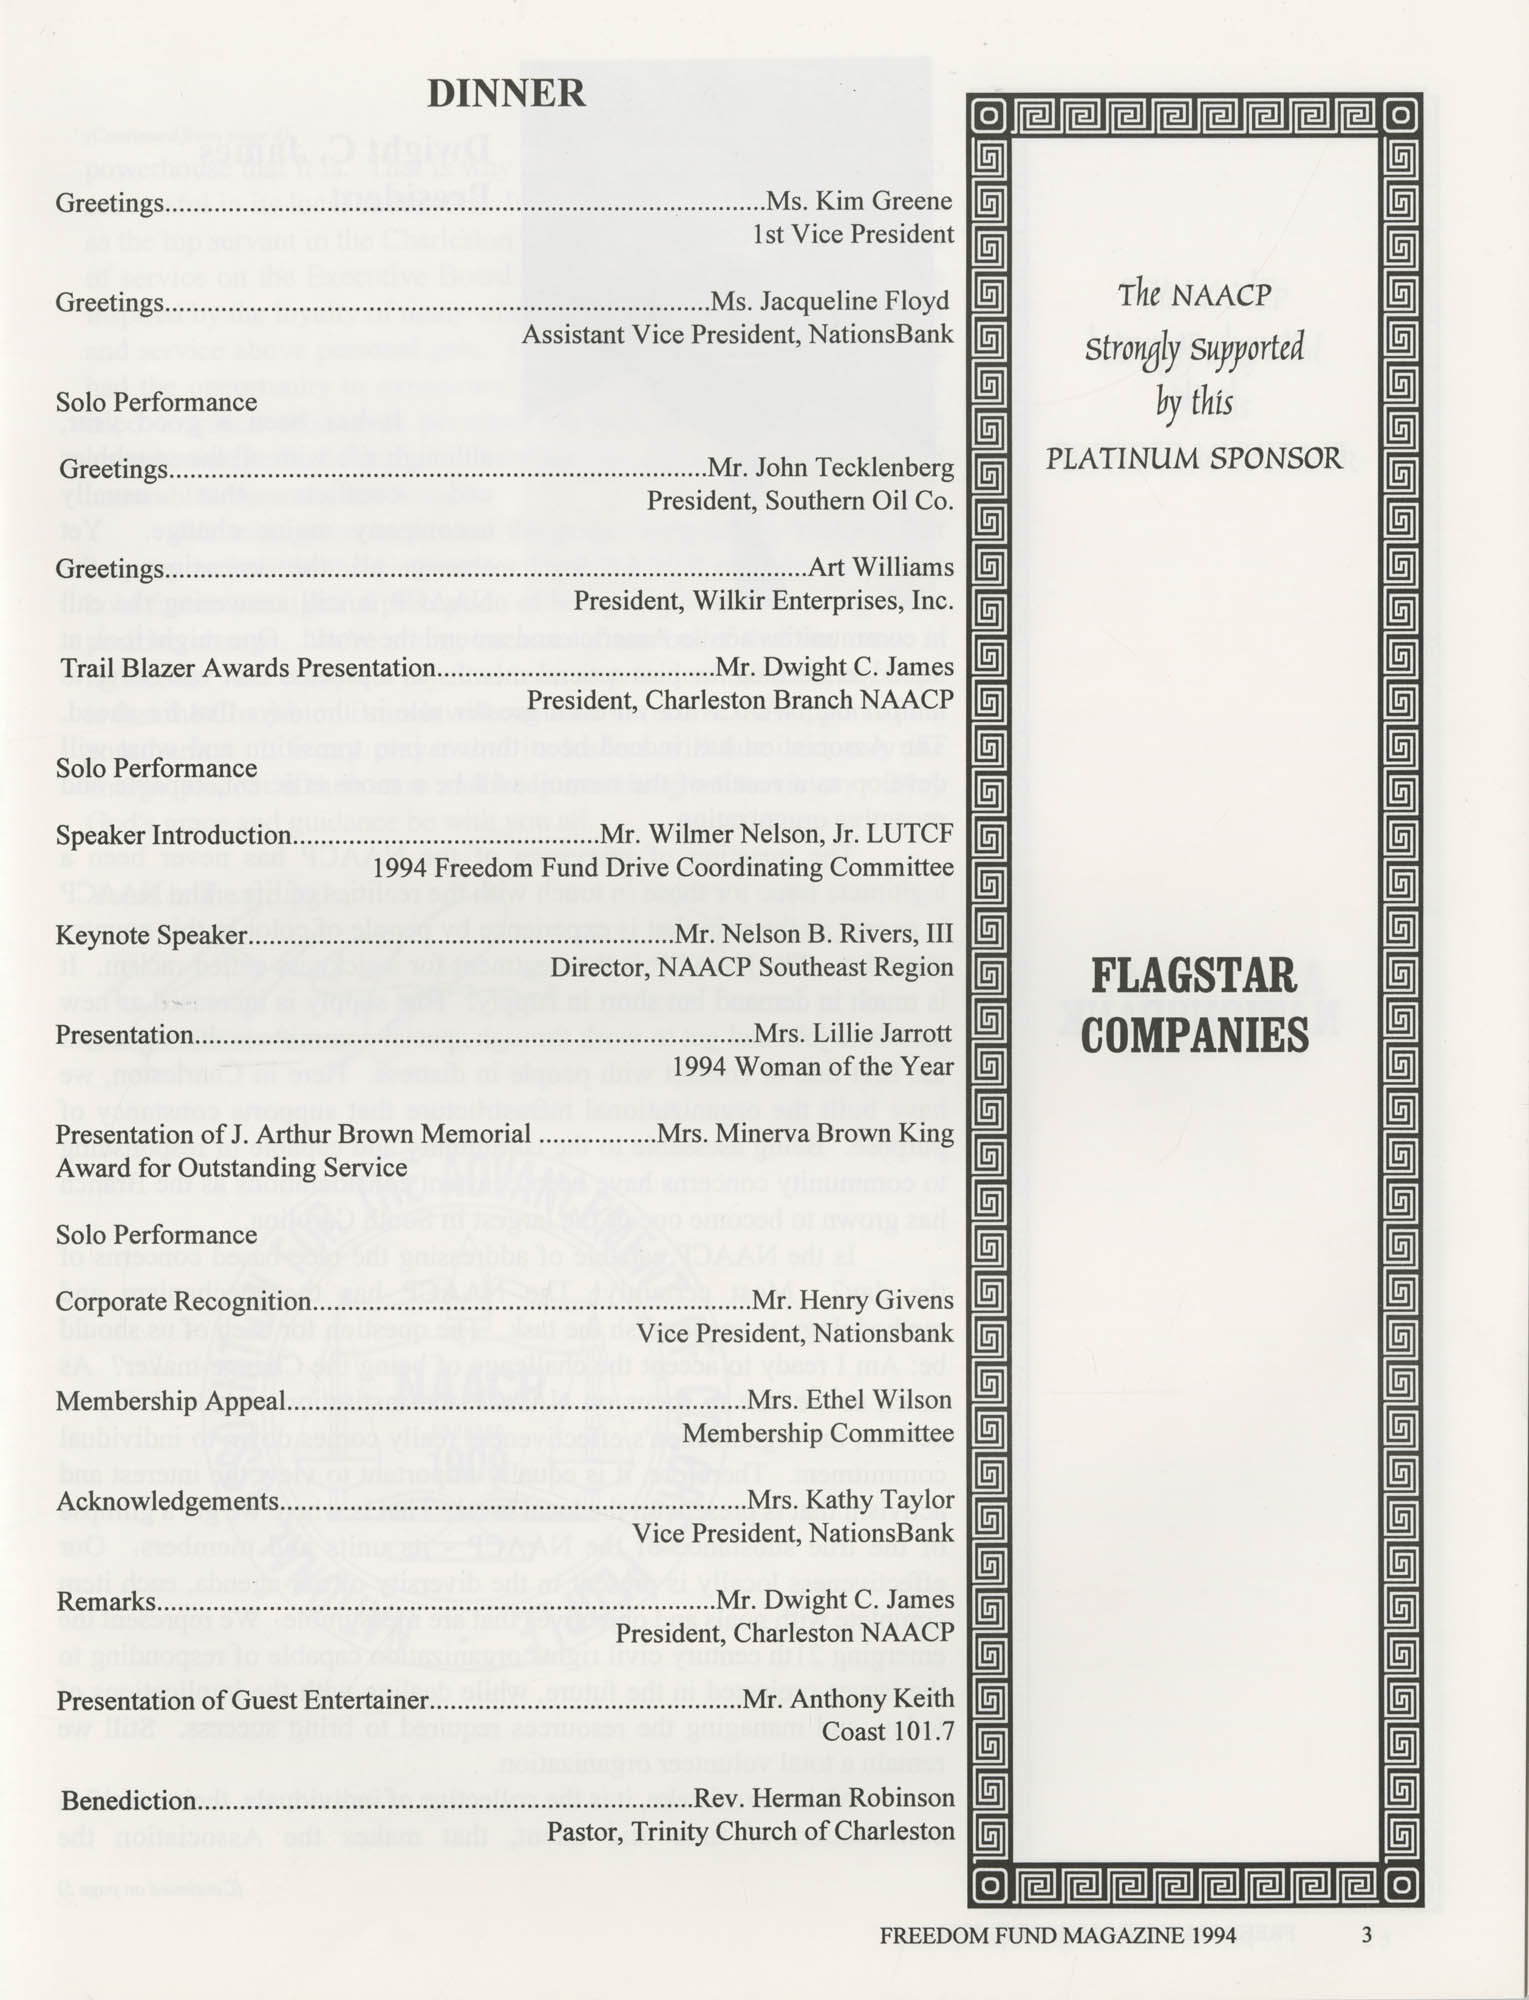 Freedom Fund Magazine, 1994, Page 3